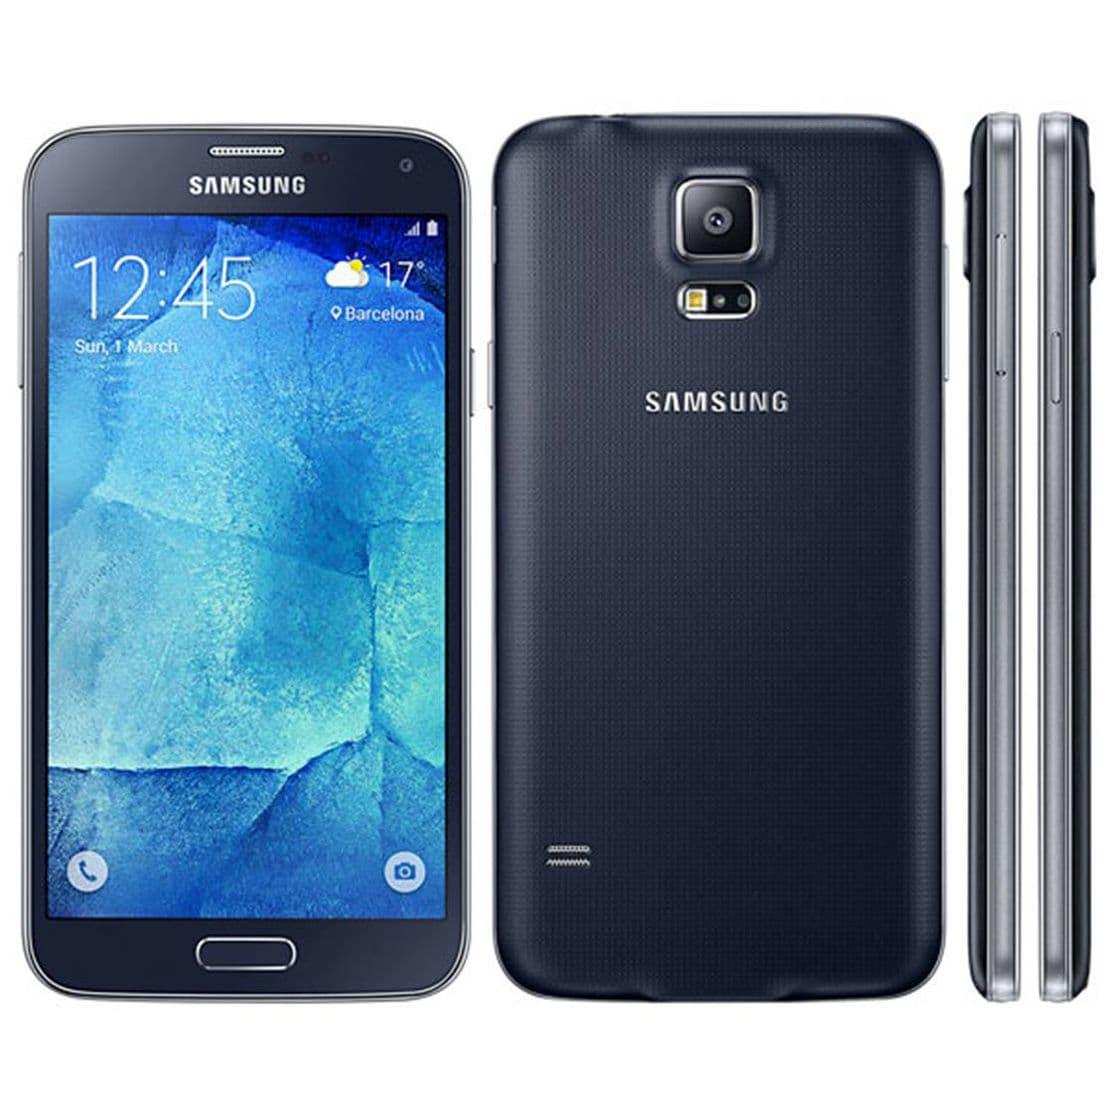 Samsung Galaxy S5 Neo buy smartphone, compare prices in ...